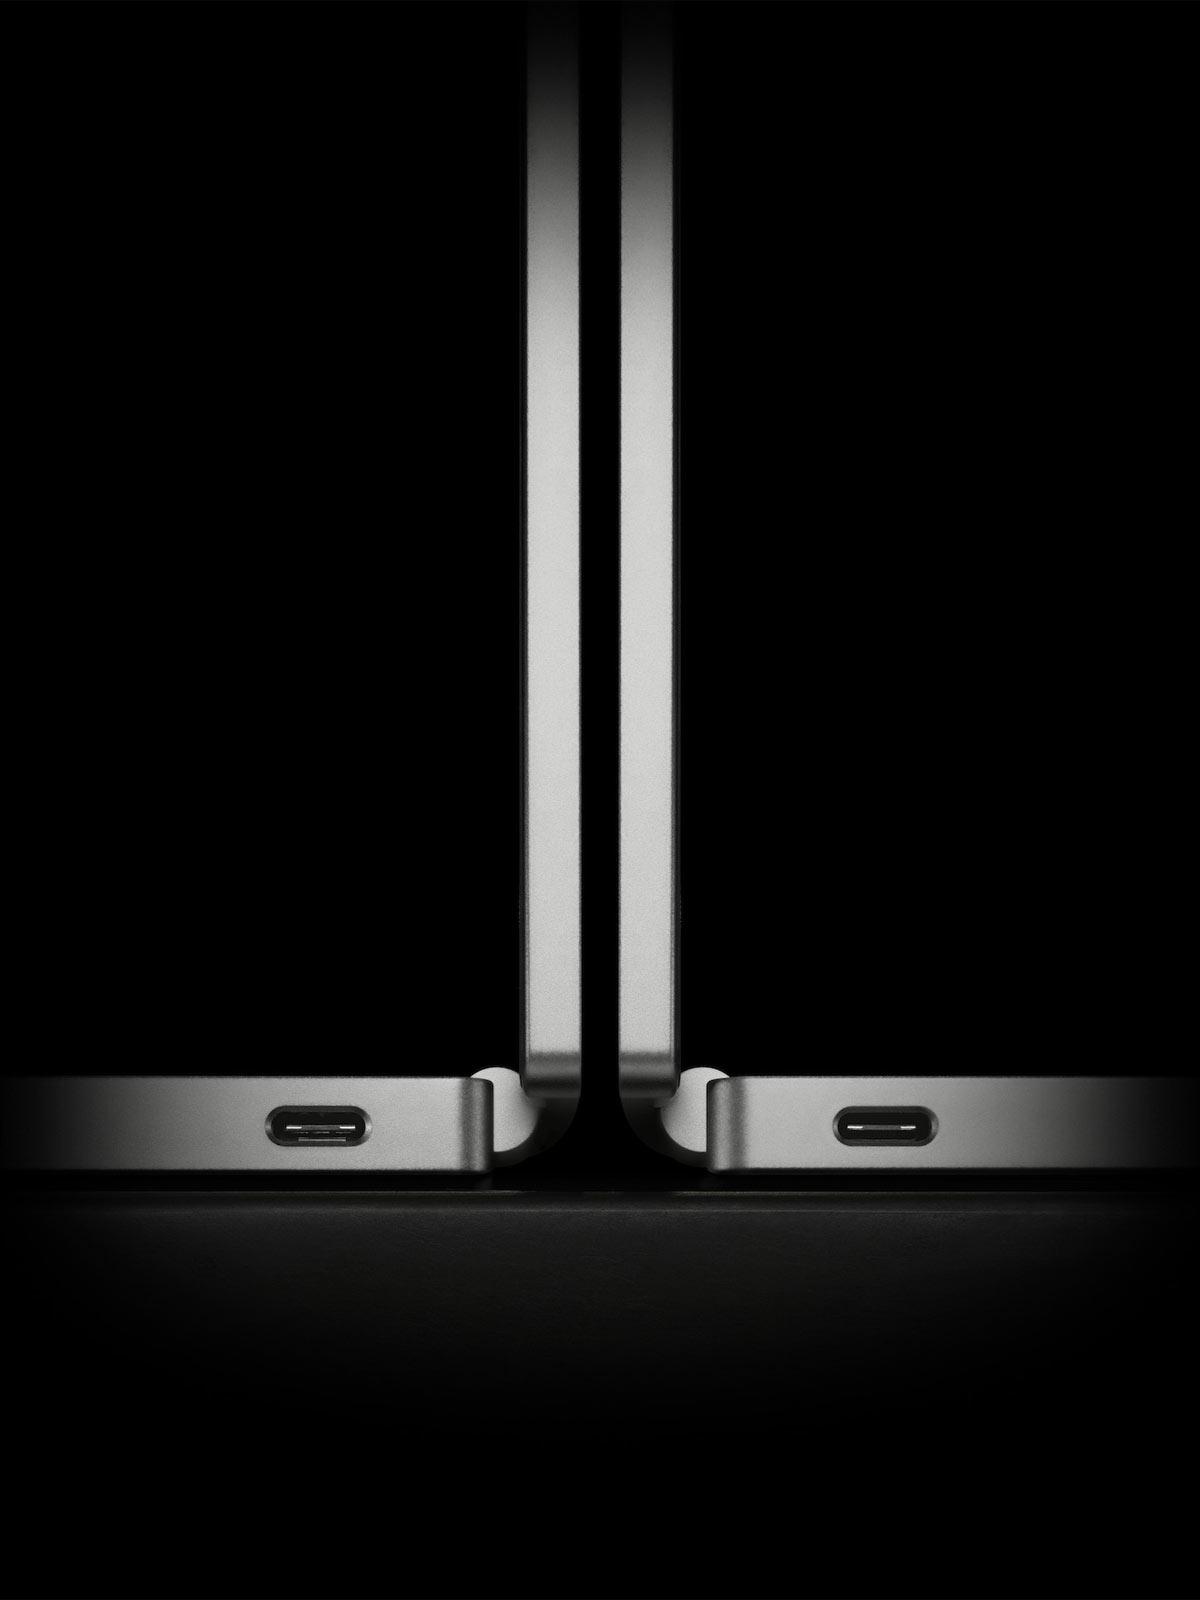 Google Chromebook Pixel 2-5